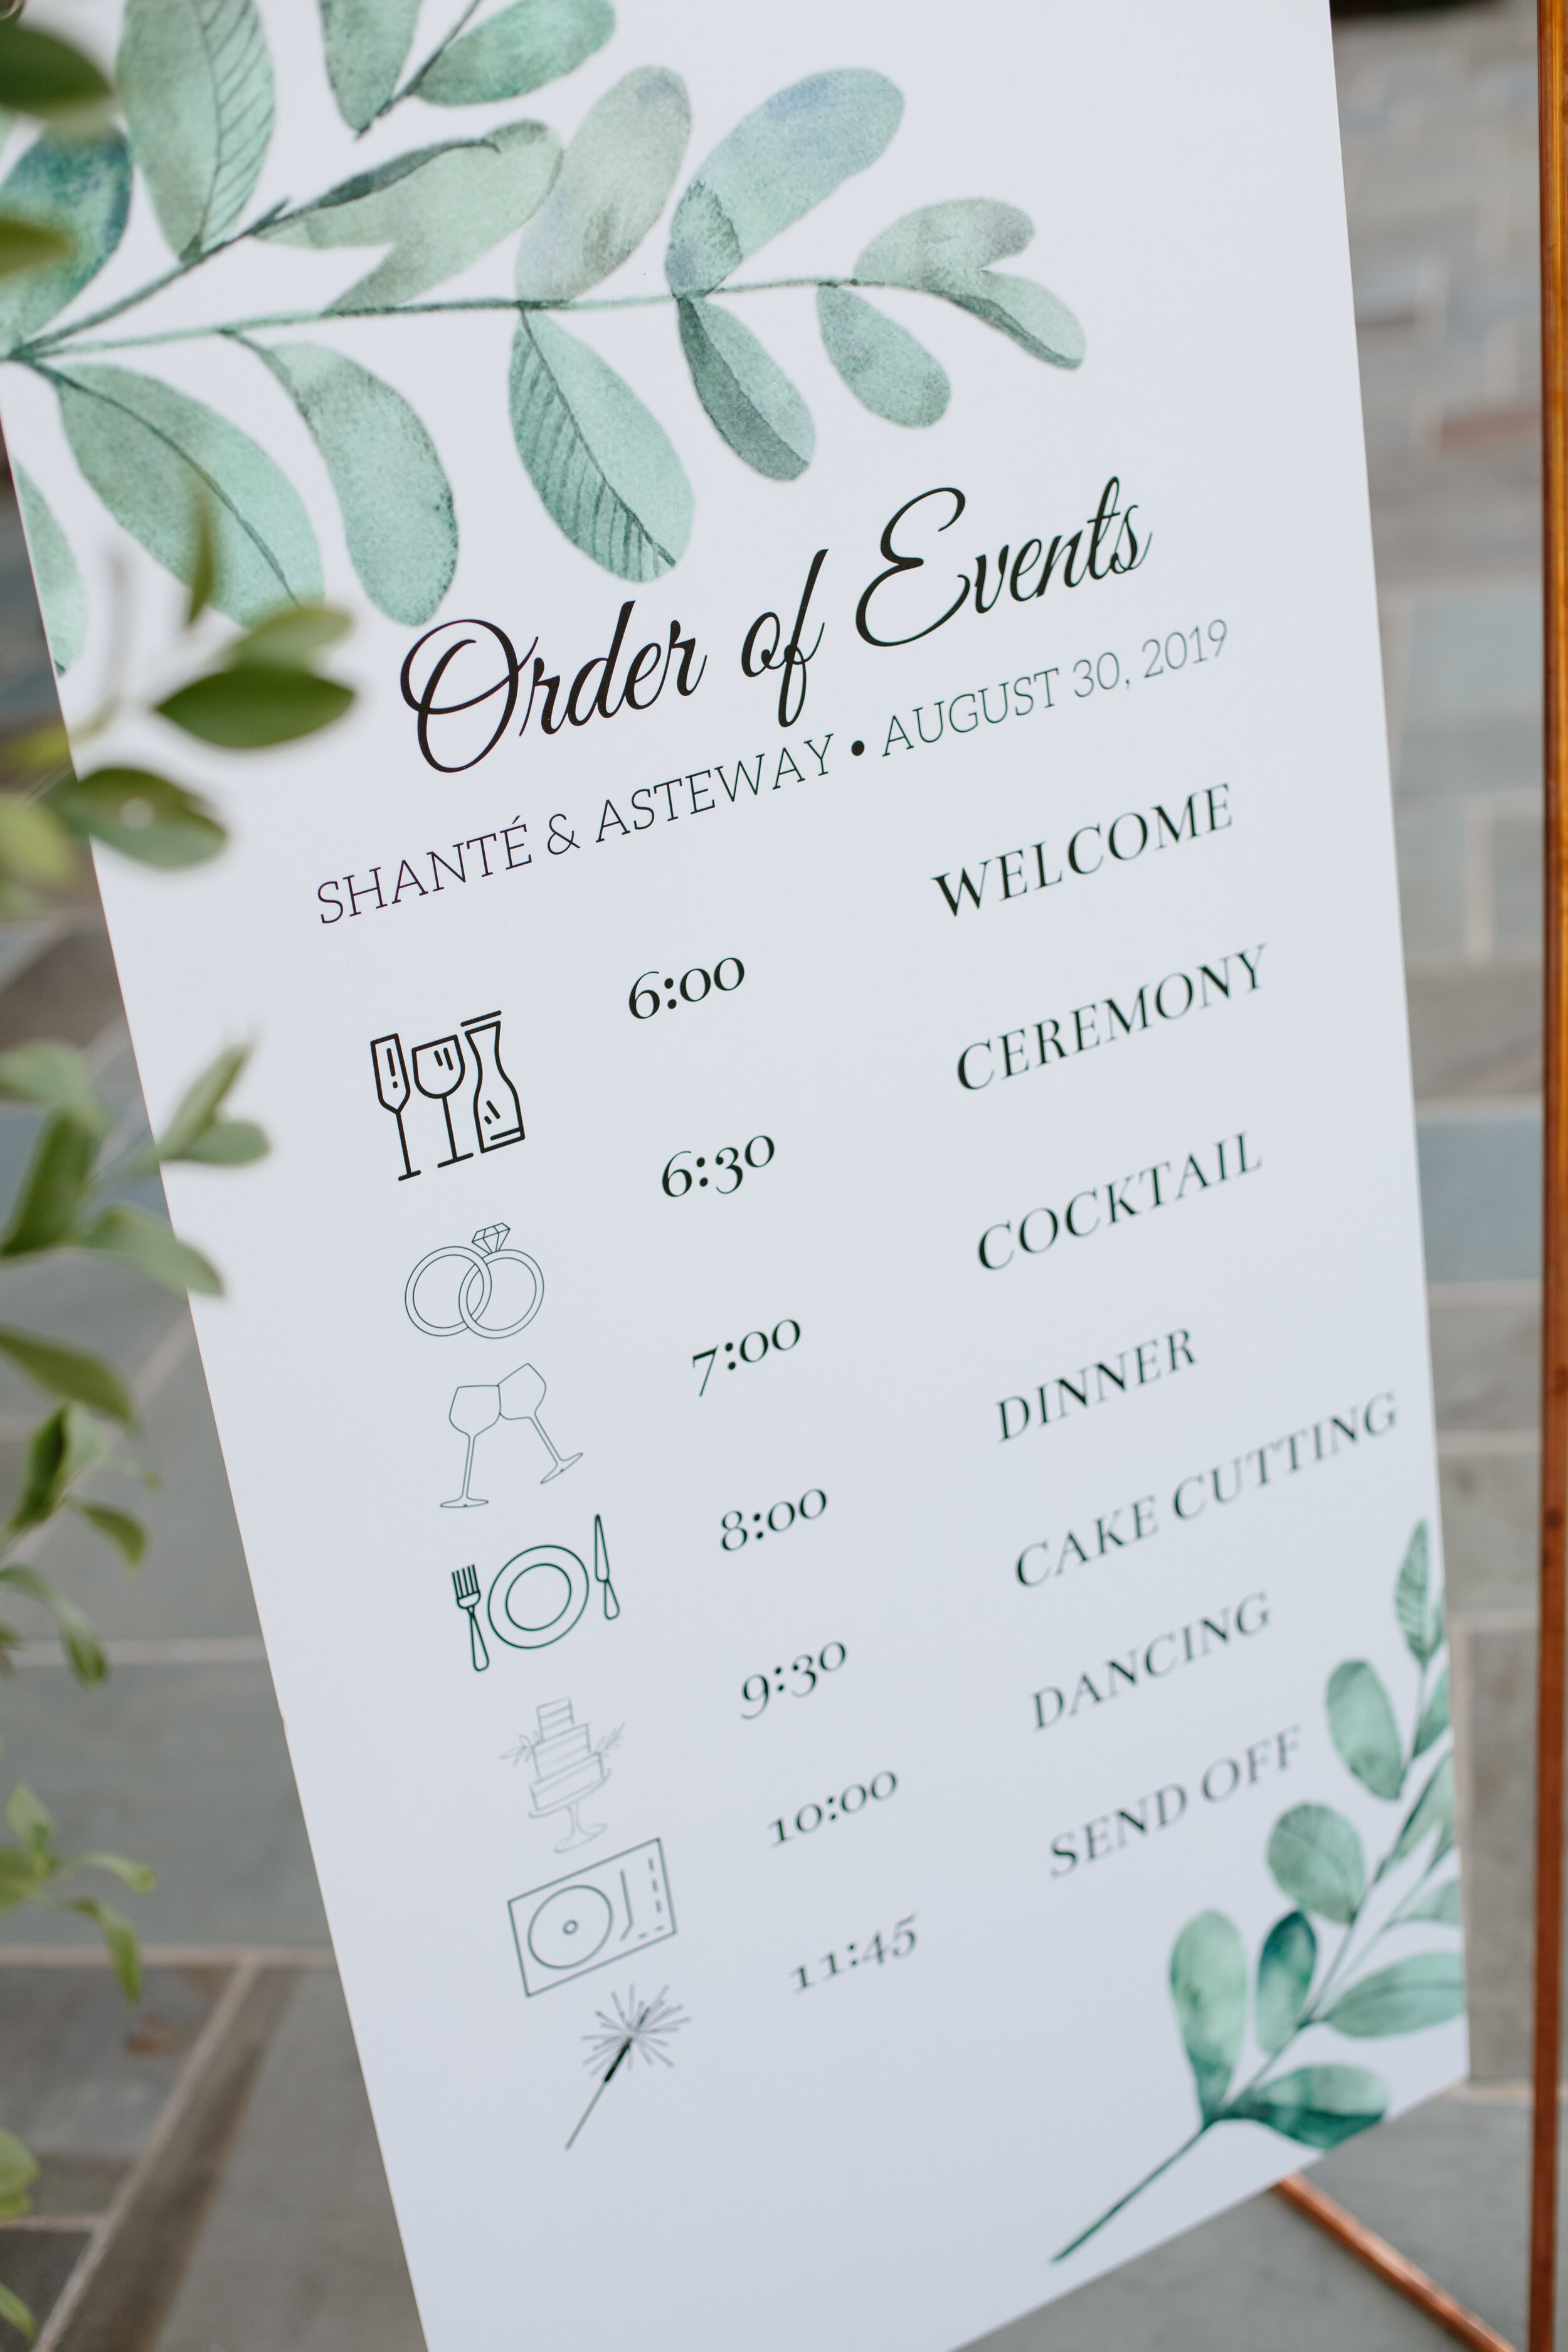 Shante-Asteway-Wedding-Andrew-Roby-Events-4.jpg